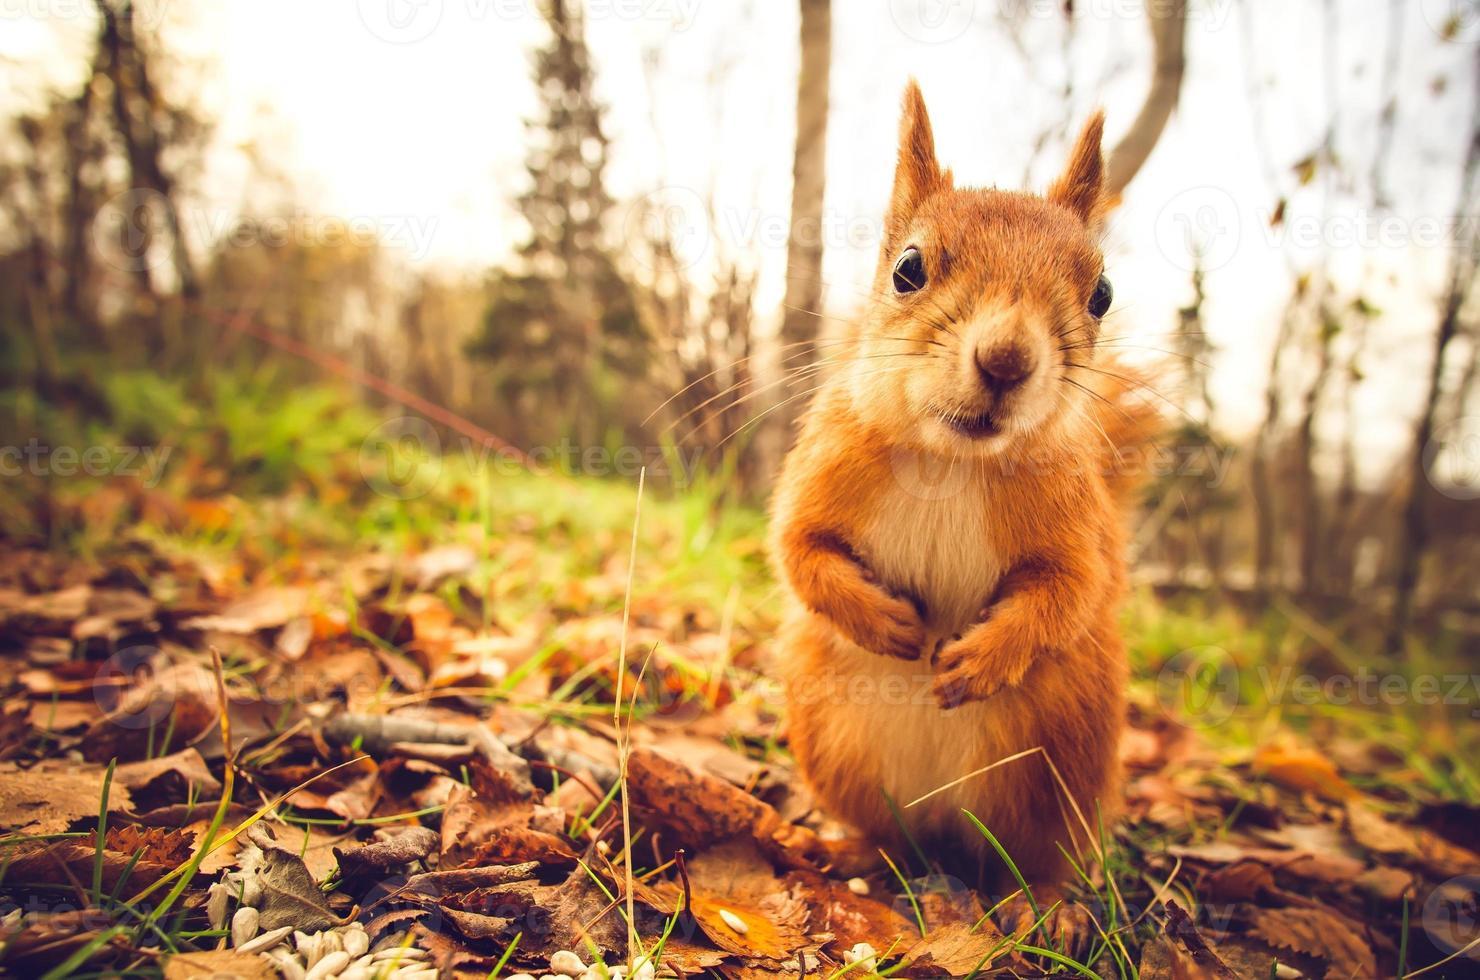 ardilla piel roja gracioso mascotas salvaje naturaleza animal temático foto